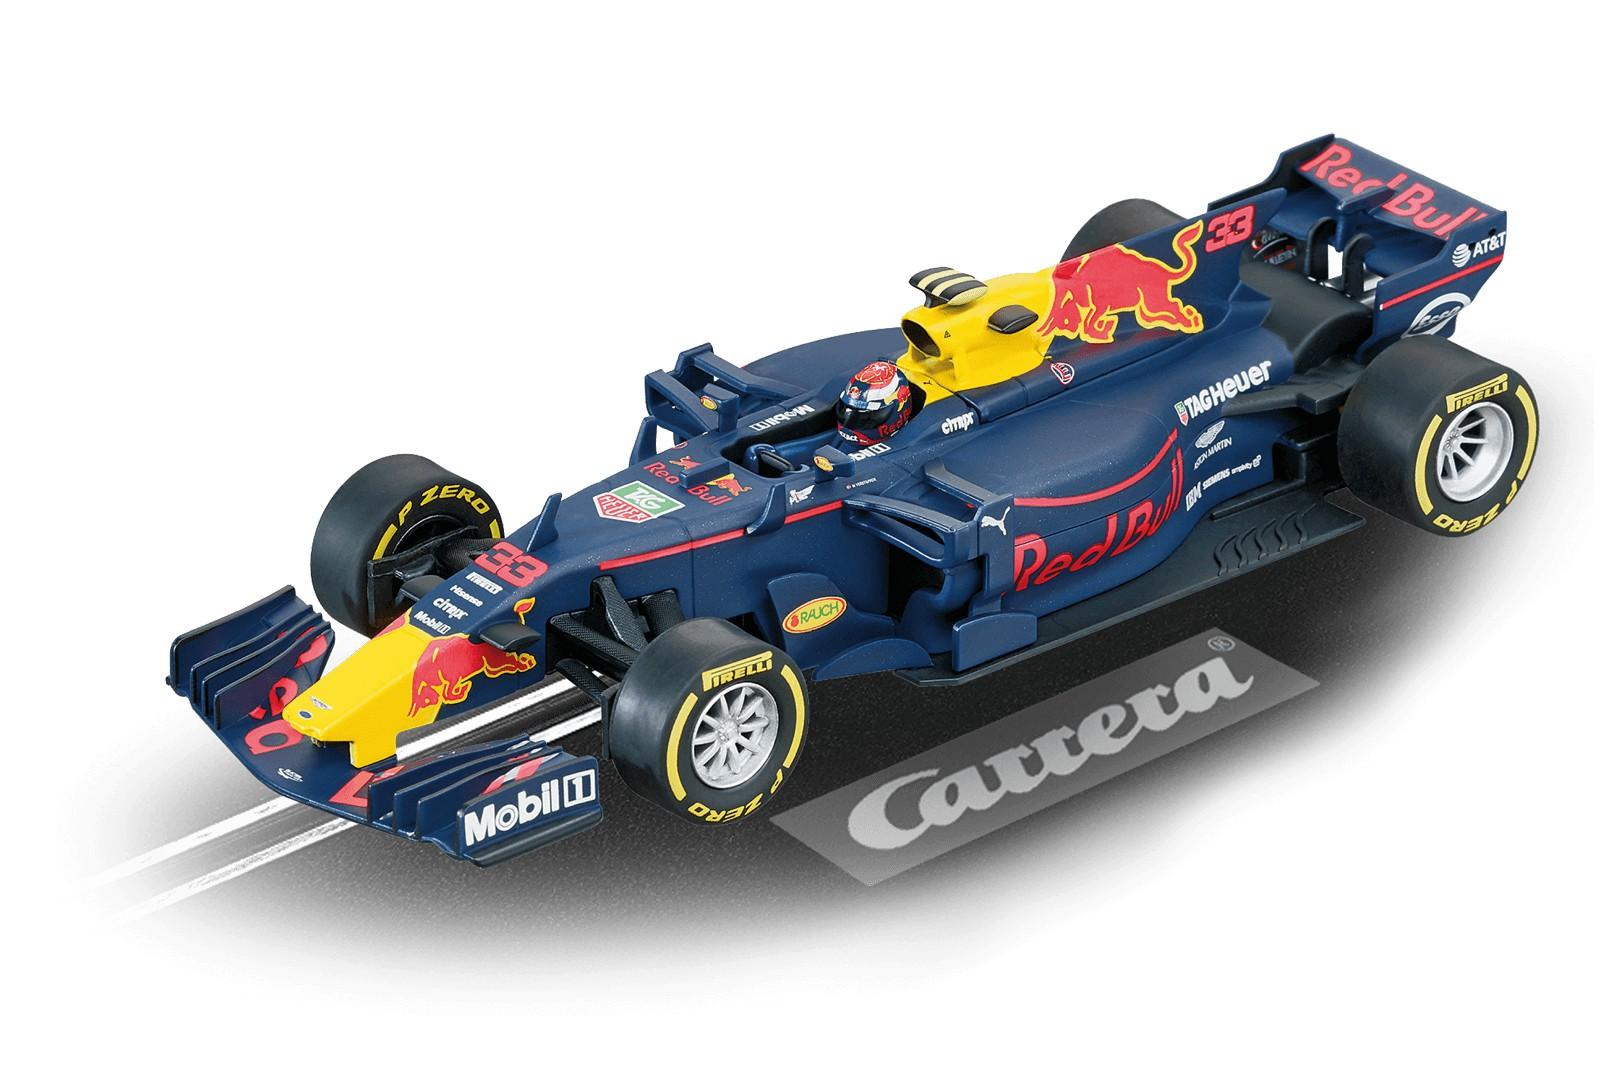 Carrera DIGITAL 132 30818 rojo Bull Racing TAG Heuer RB13  M.Verstappen, No.33